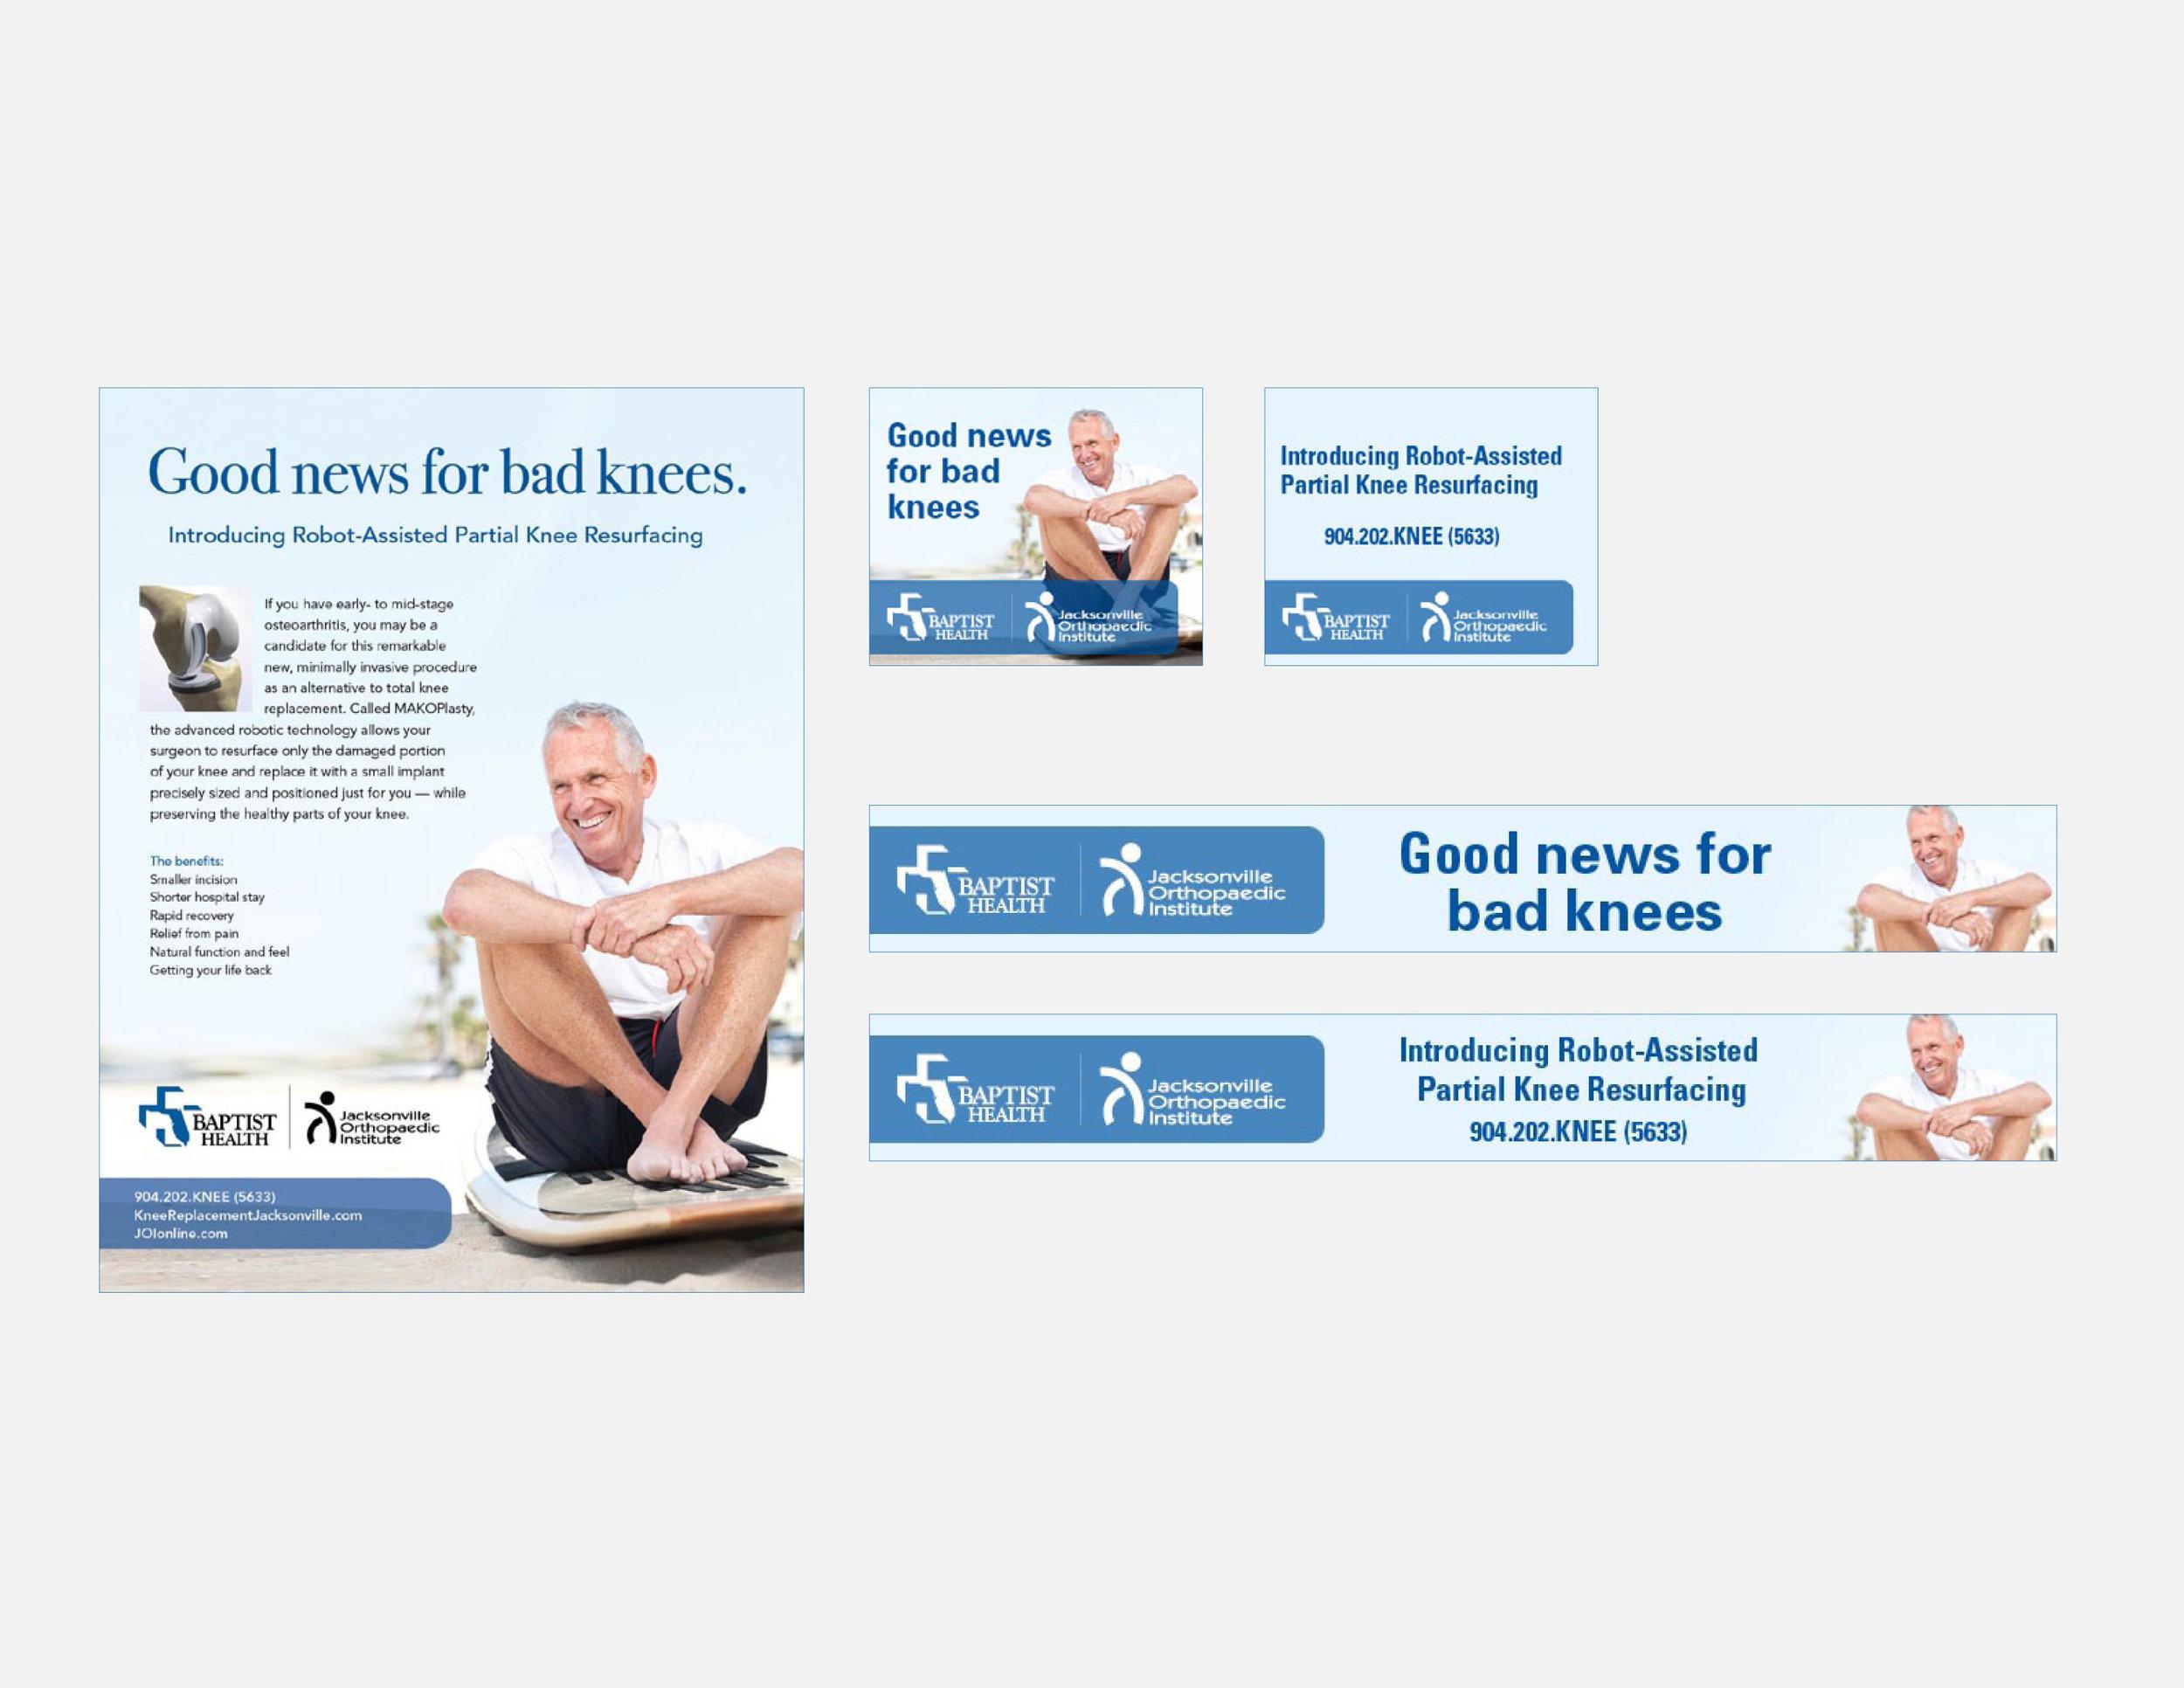 Baptist Health MAKOPlasty Campaign - Flyer & web ads